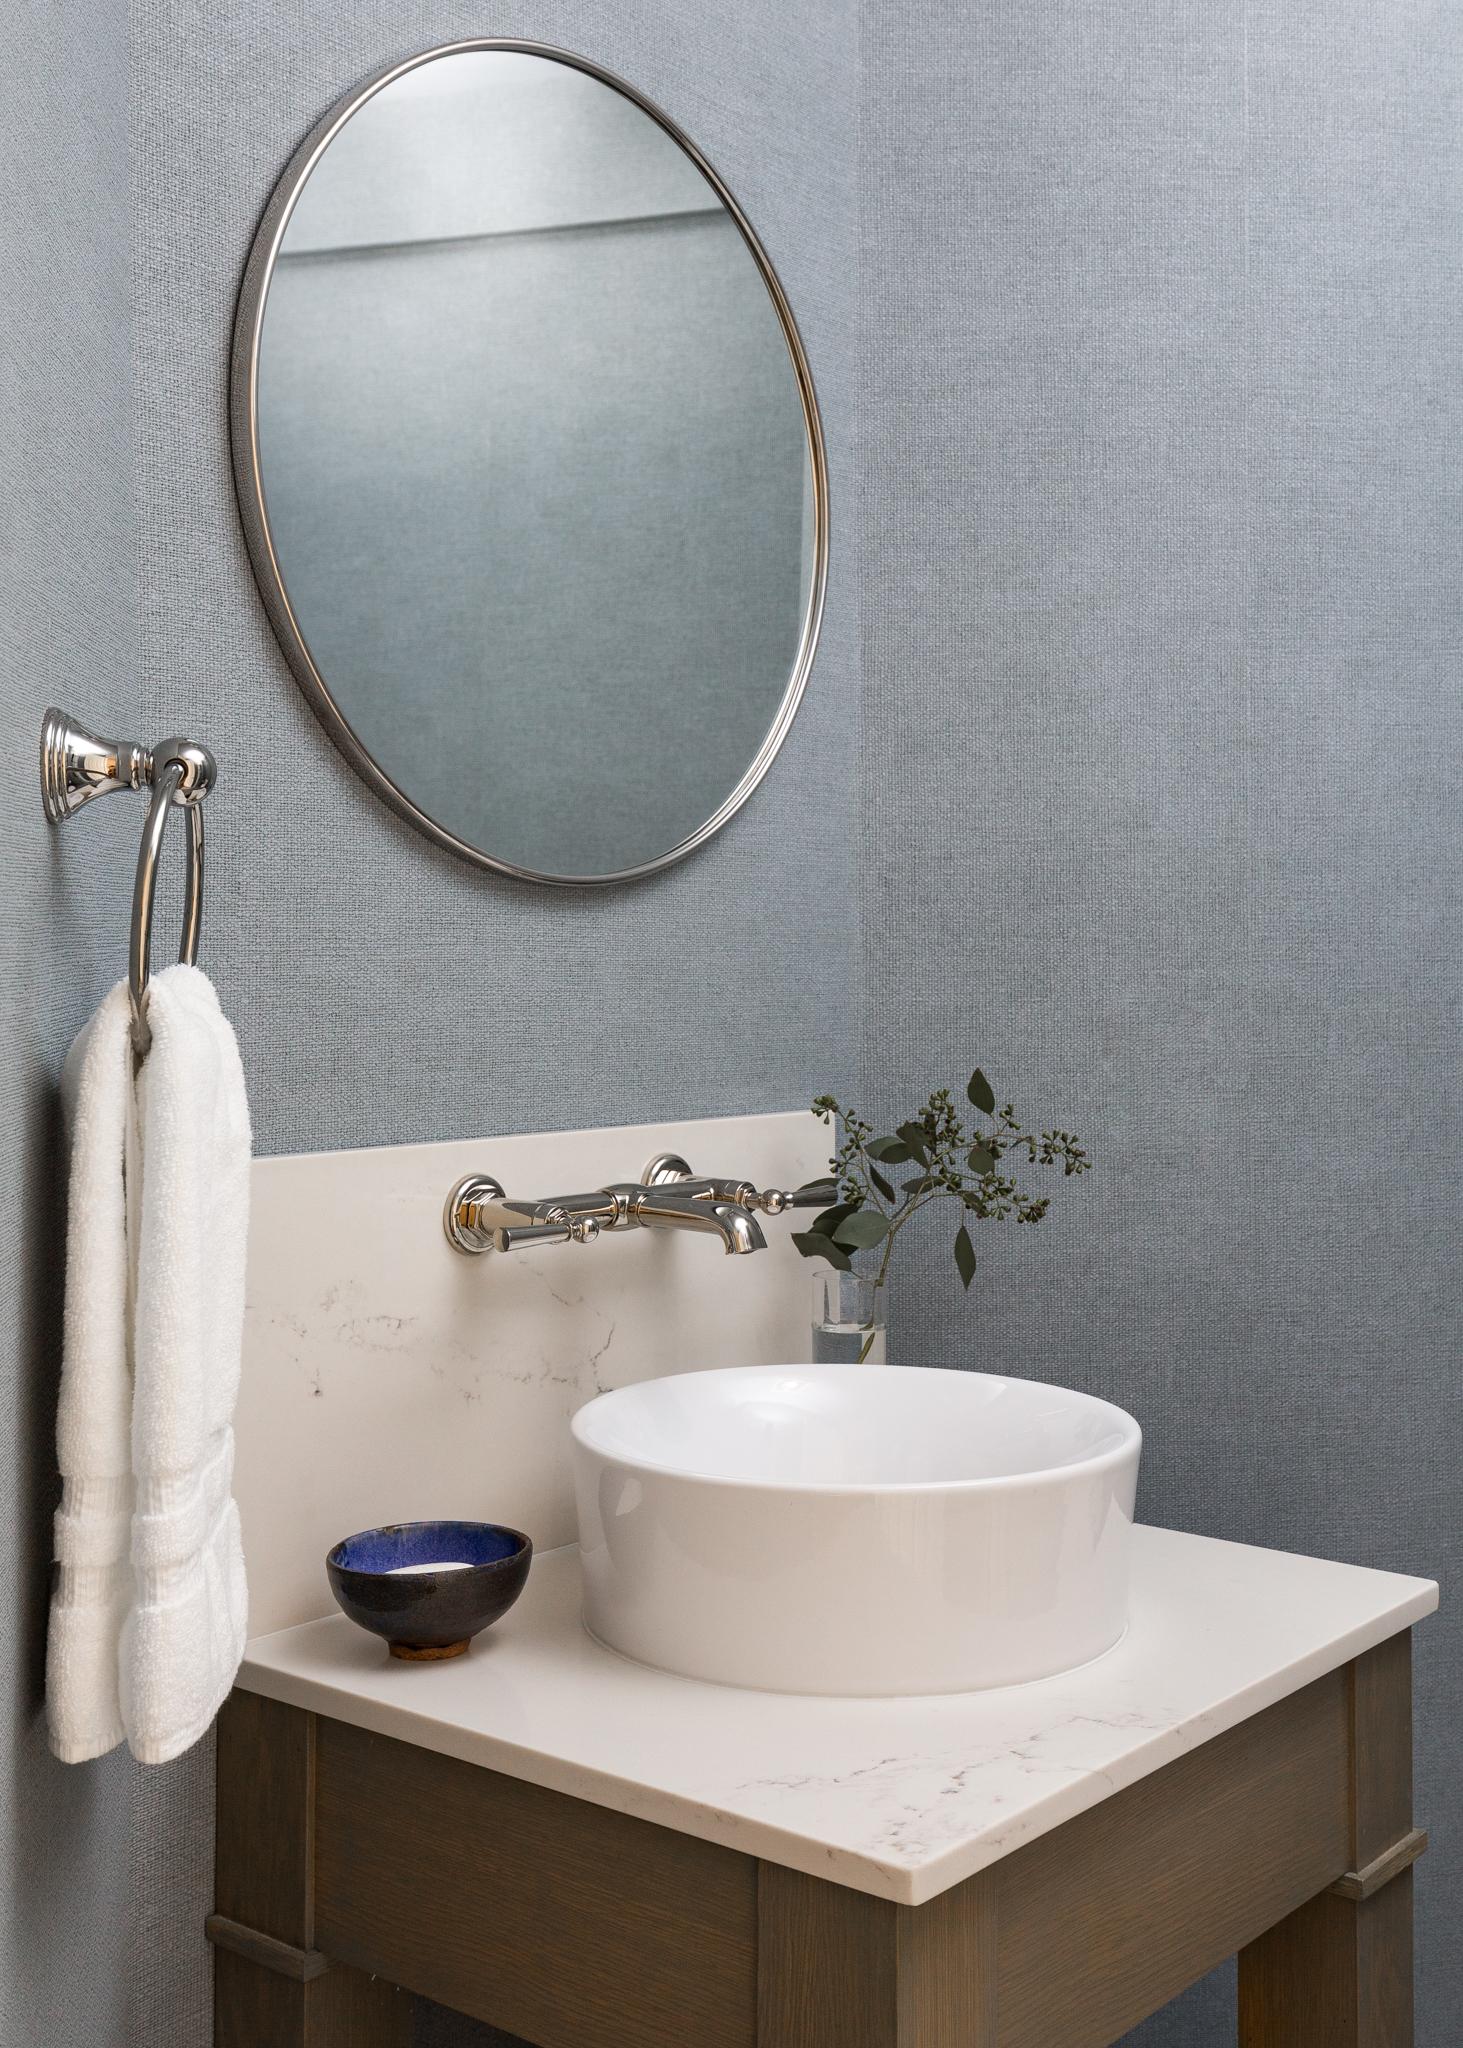 Powder room vessel sink Carla Aston, Designer.jpg